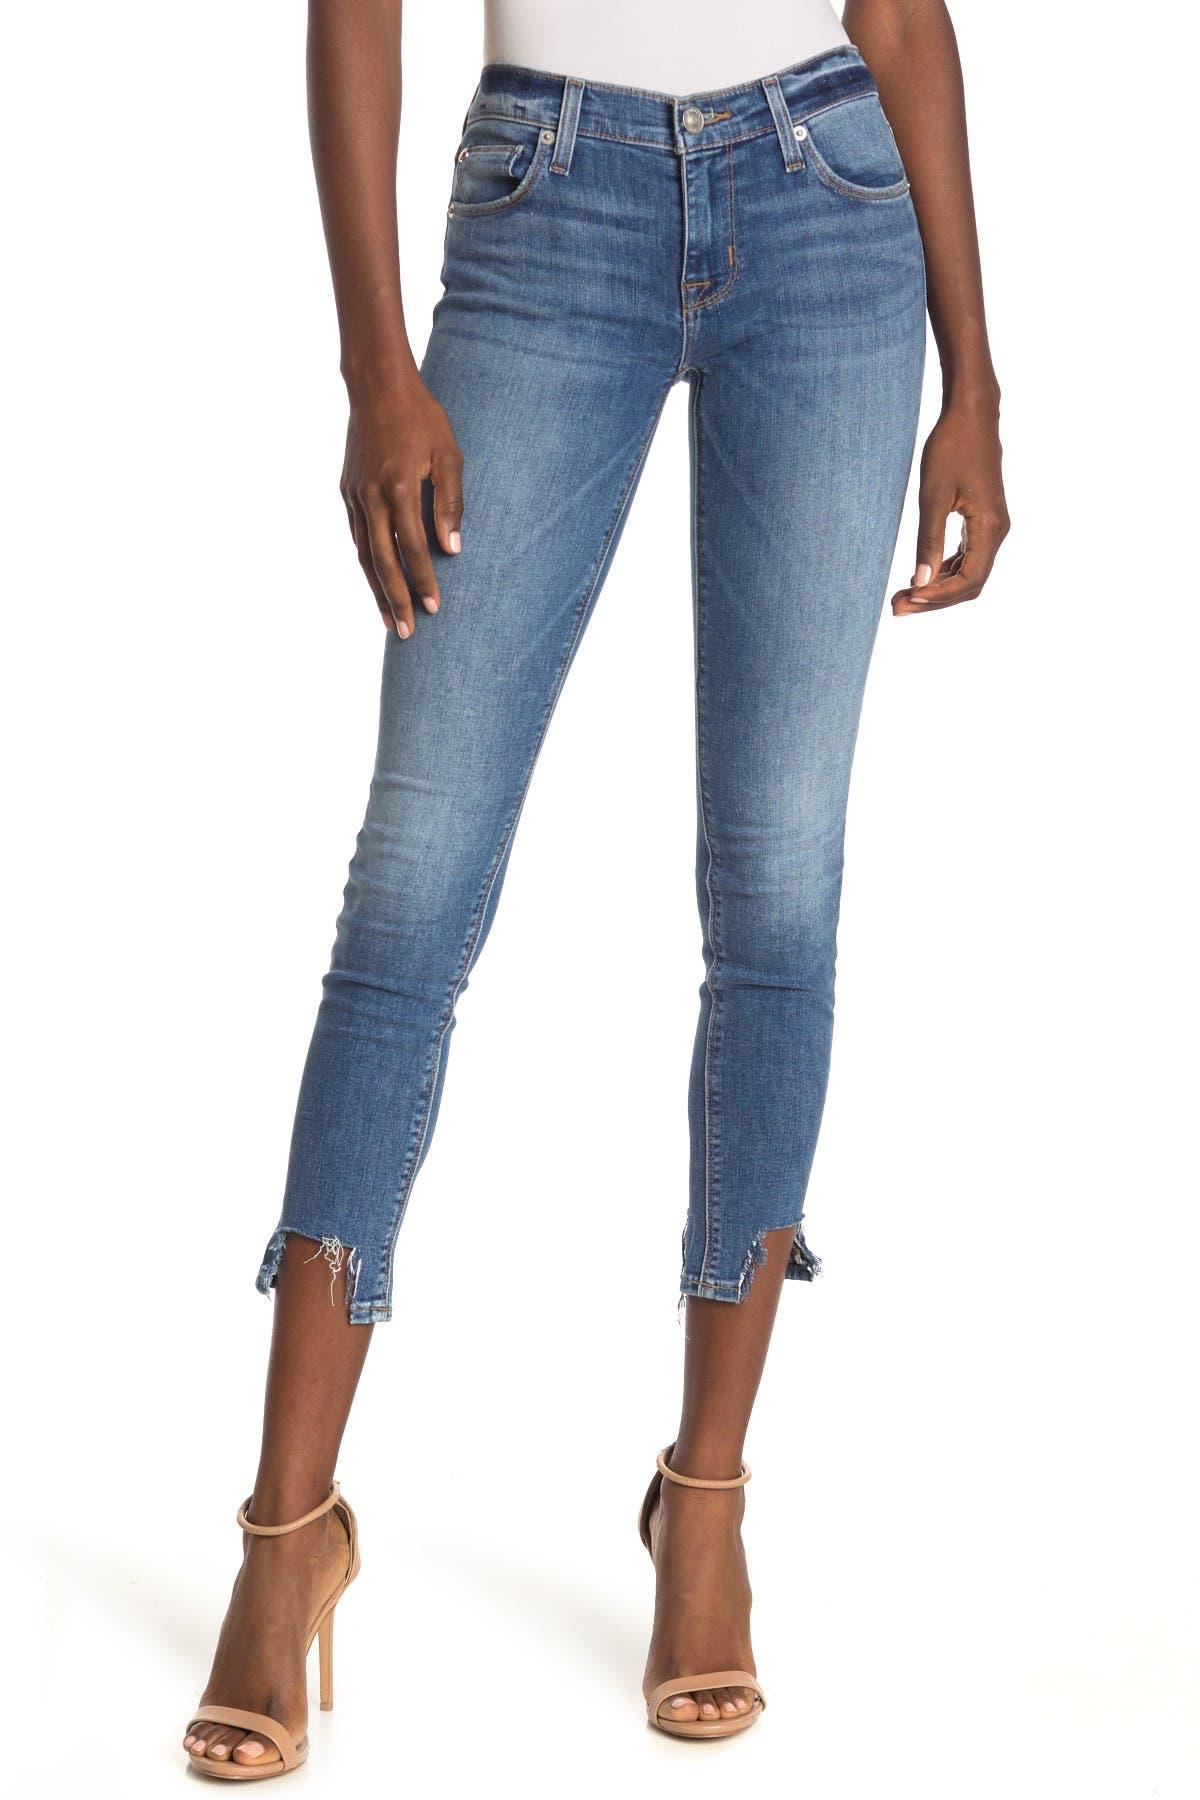 Image of HUDSON Jeans Krista Ankle Skinny Jeans